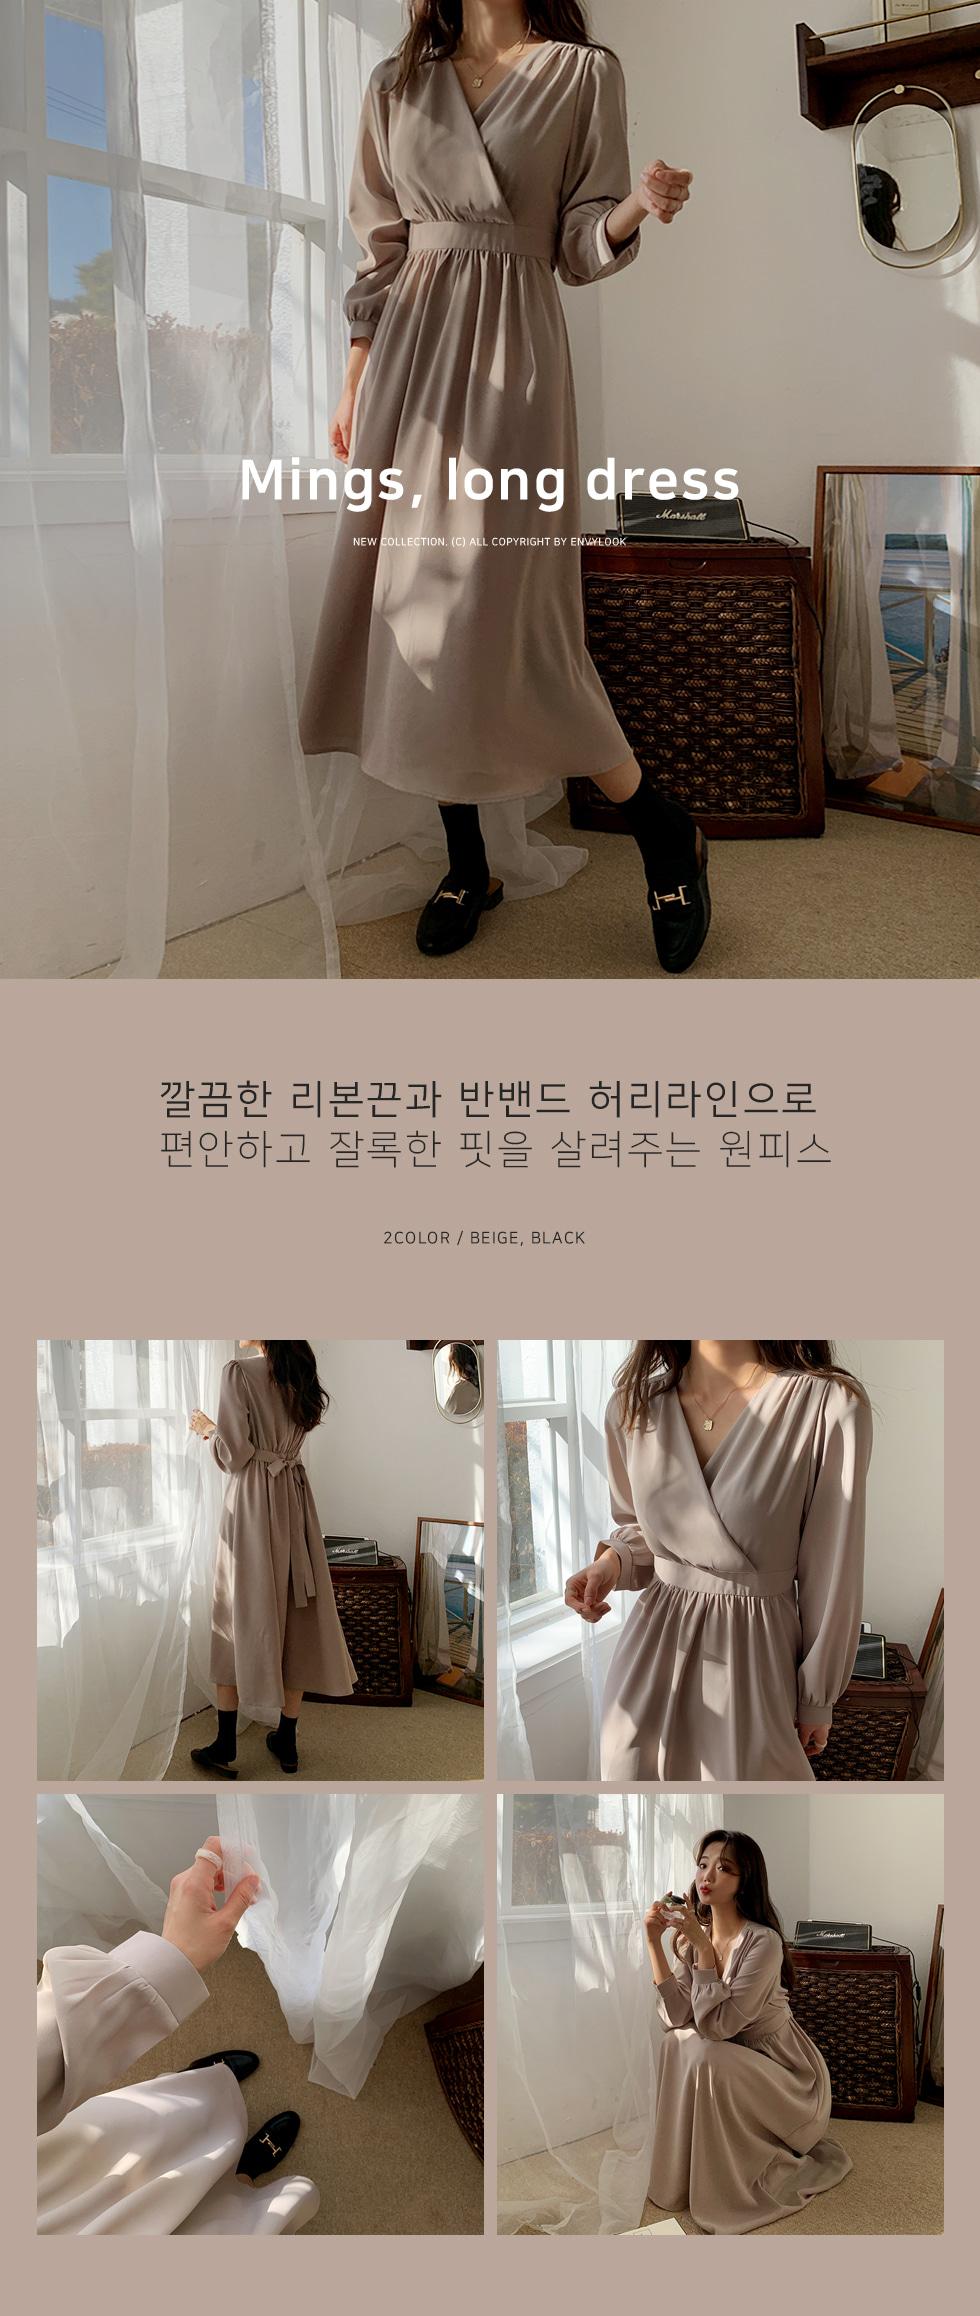 Ming's Long Dress